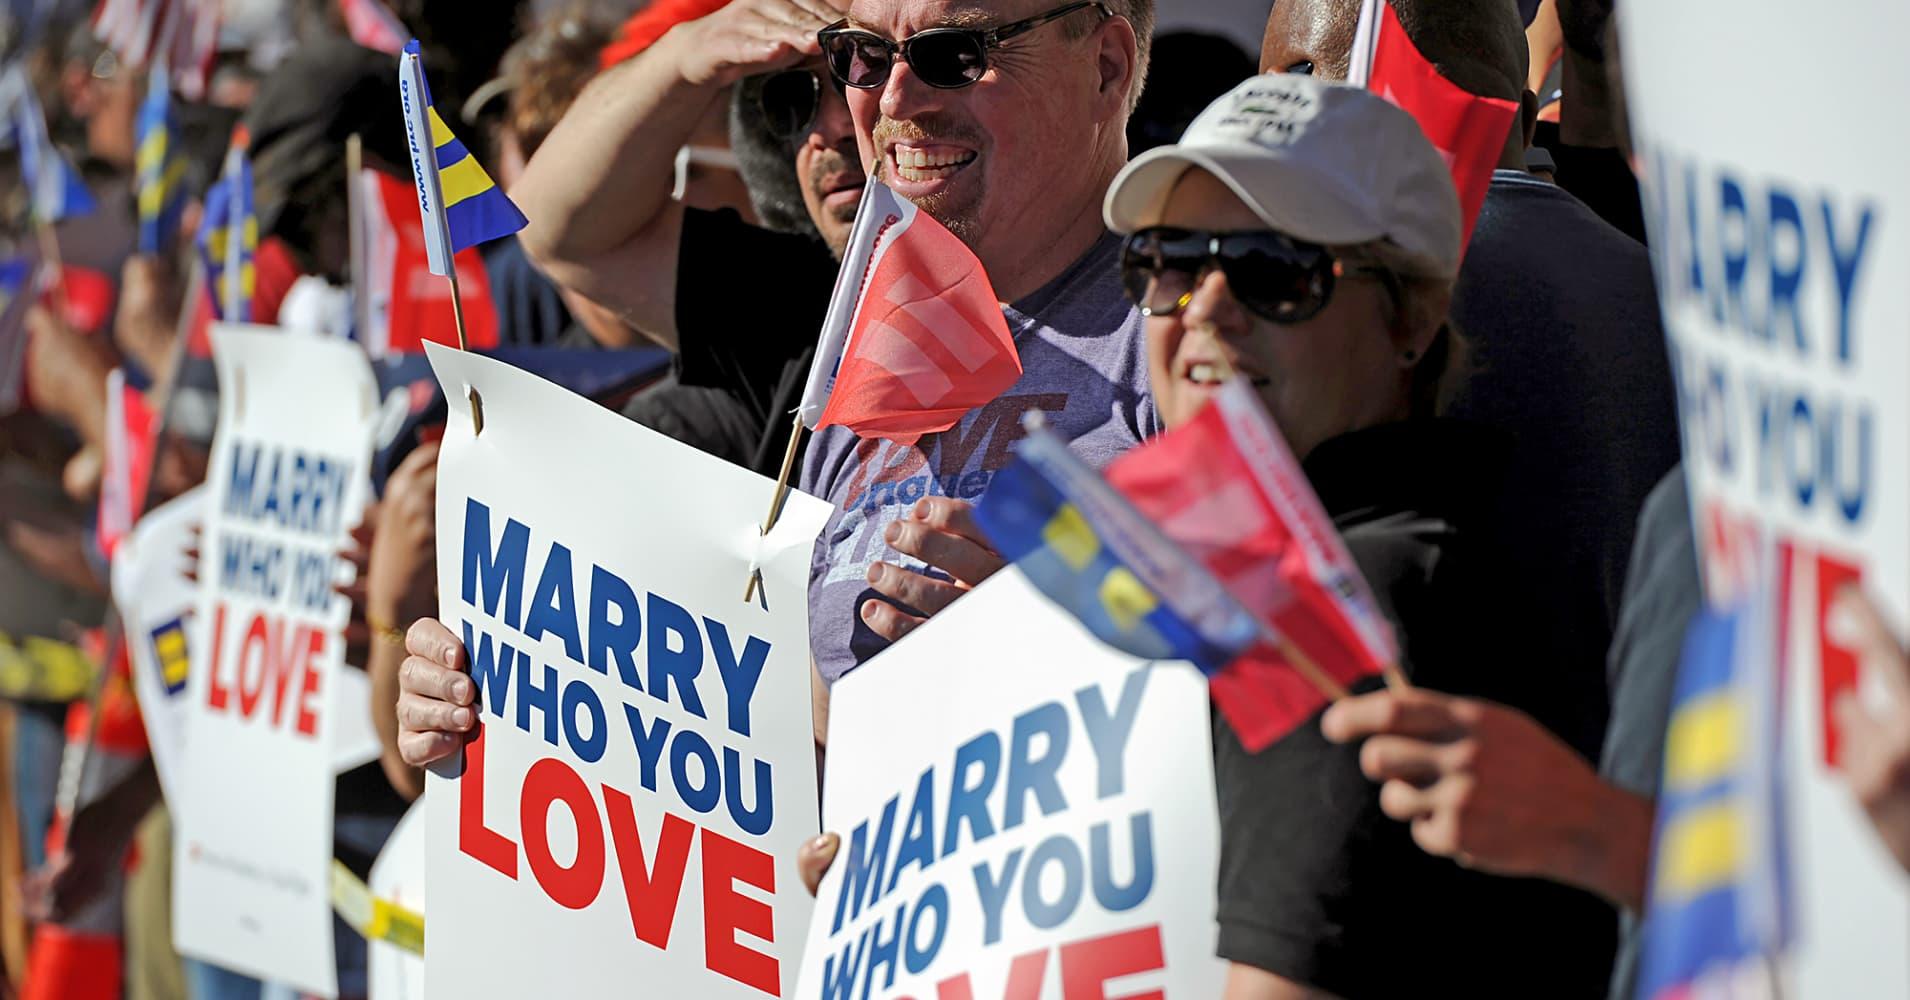 negatives of same sex marriage in Bellevue